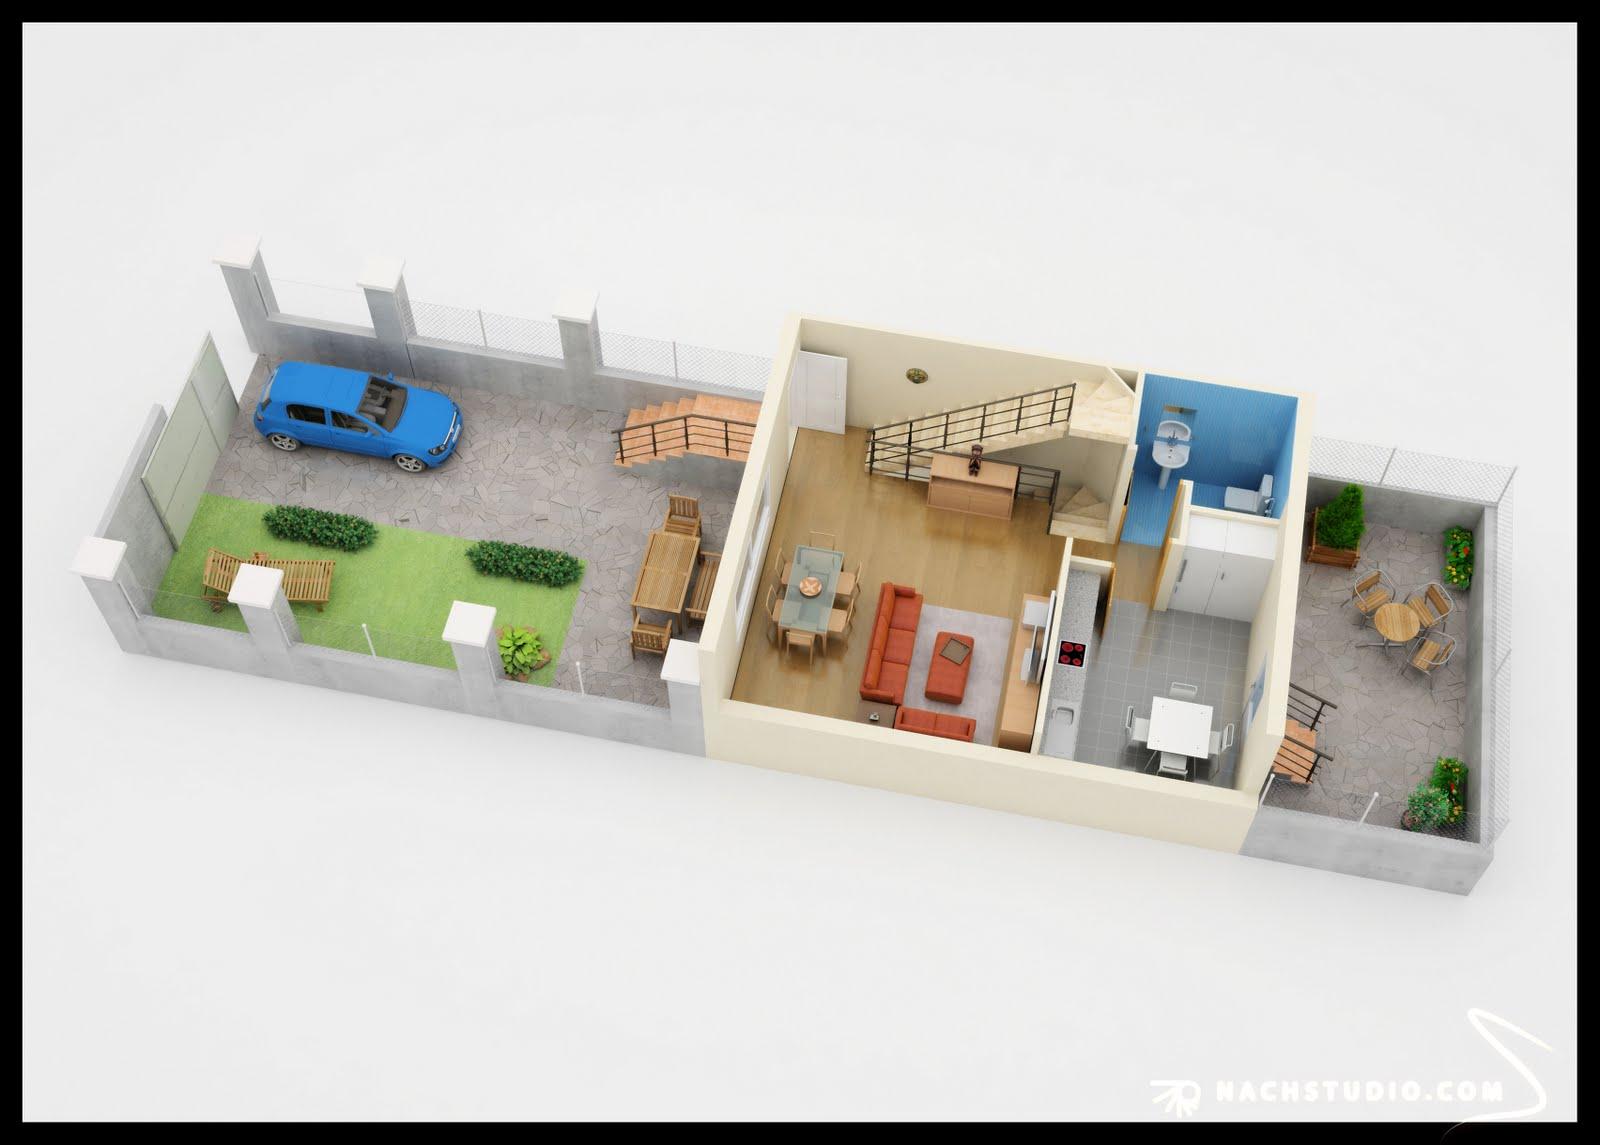 Nachstudio plantas en 3d infografia para zaragoza for Infografia 3d